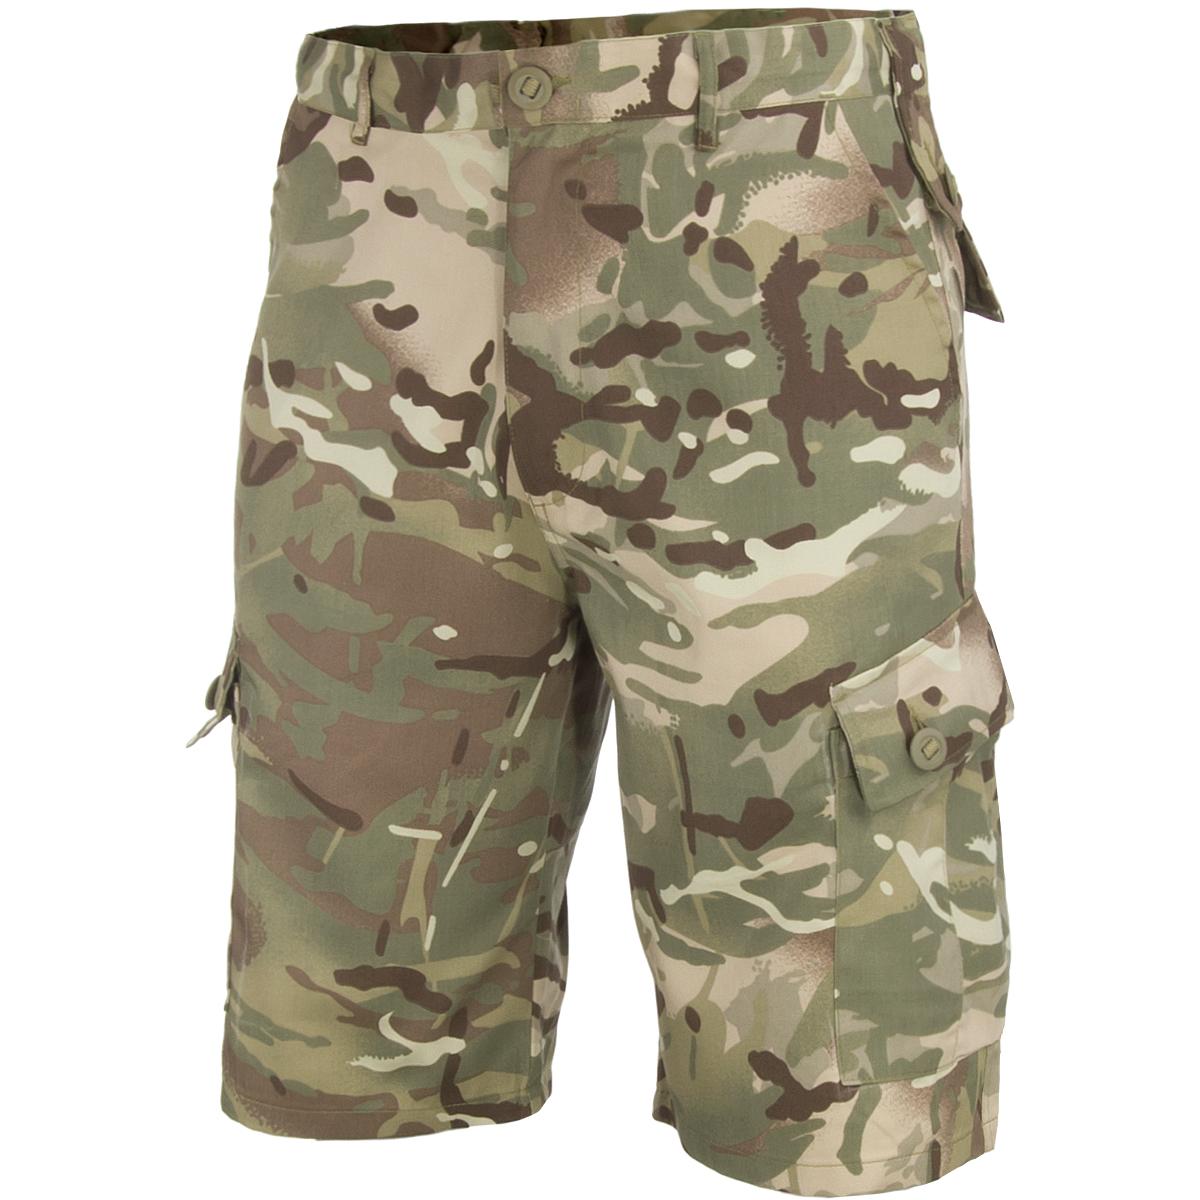 Highlander Elite Trousers Outdoor Polycotton Trekking Fishing Hunting HMTC Camo